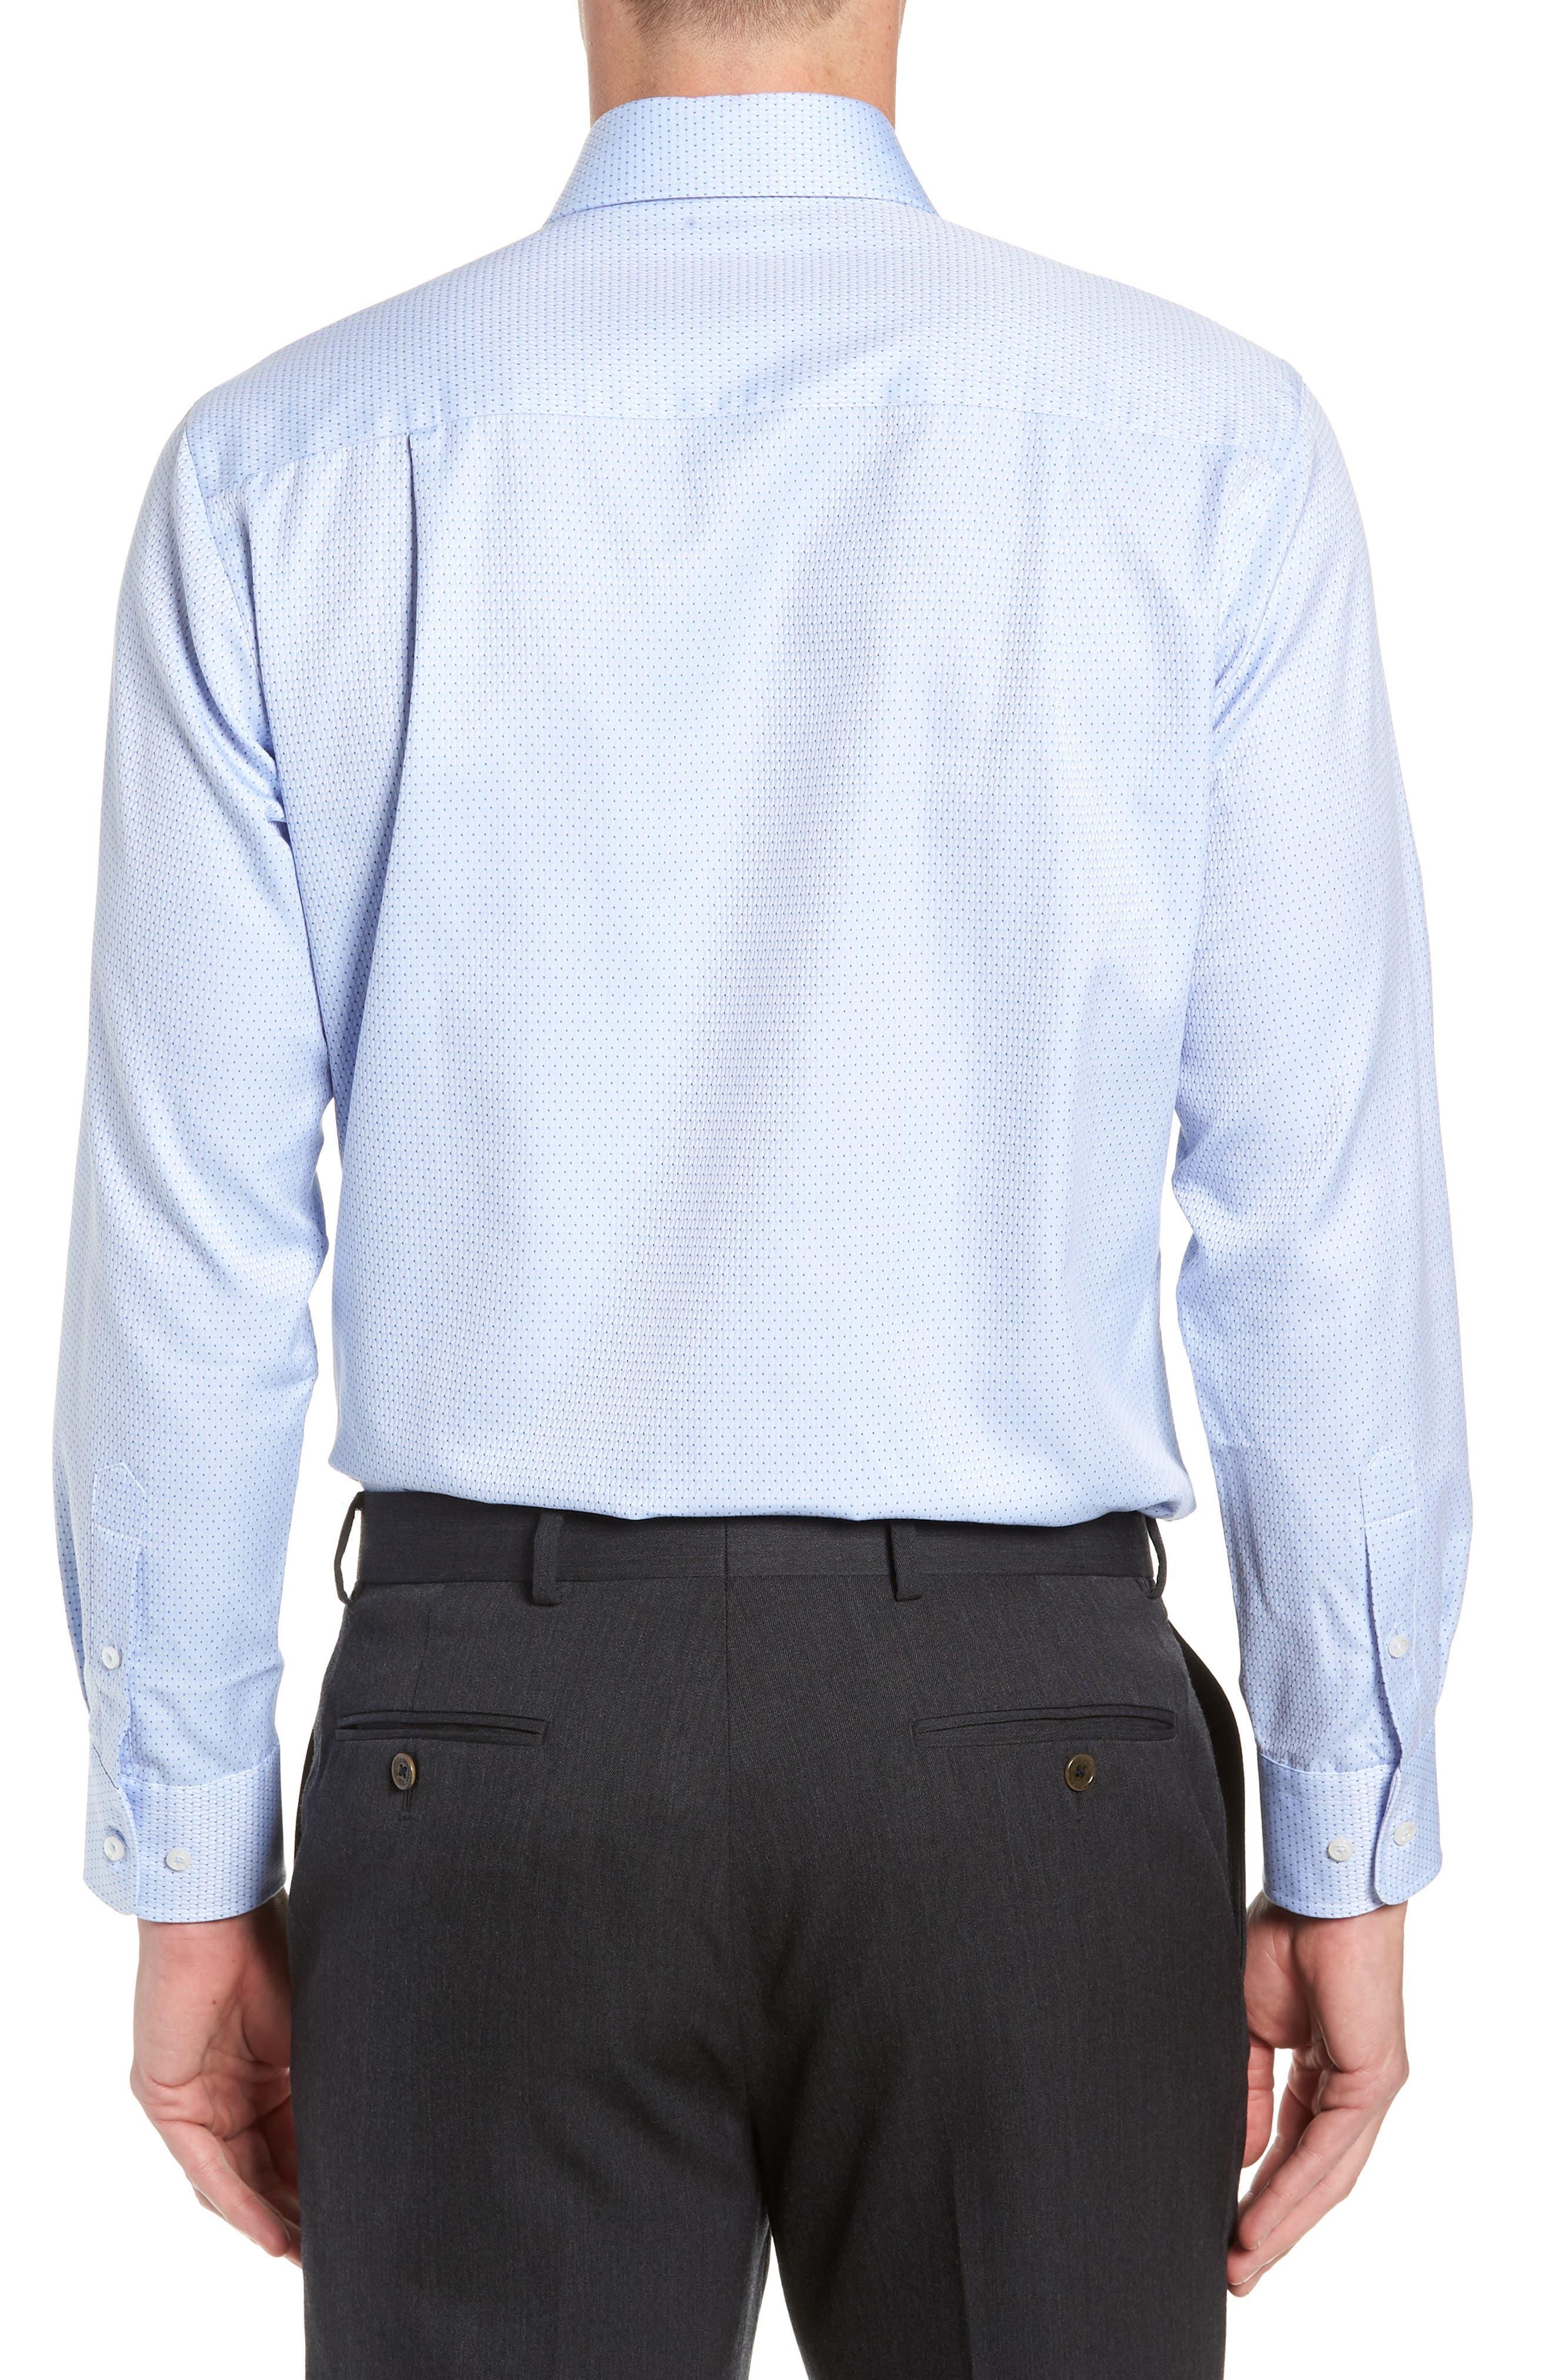 Trim Fit Check Dress Shirt,                             Alternate thumbnail 3, color,                             SKY/ NAVY